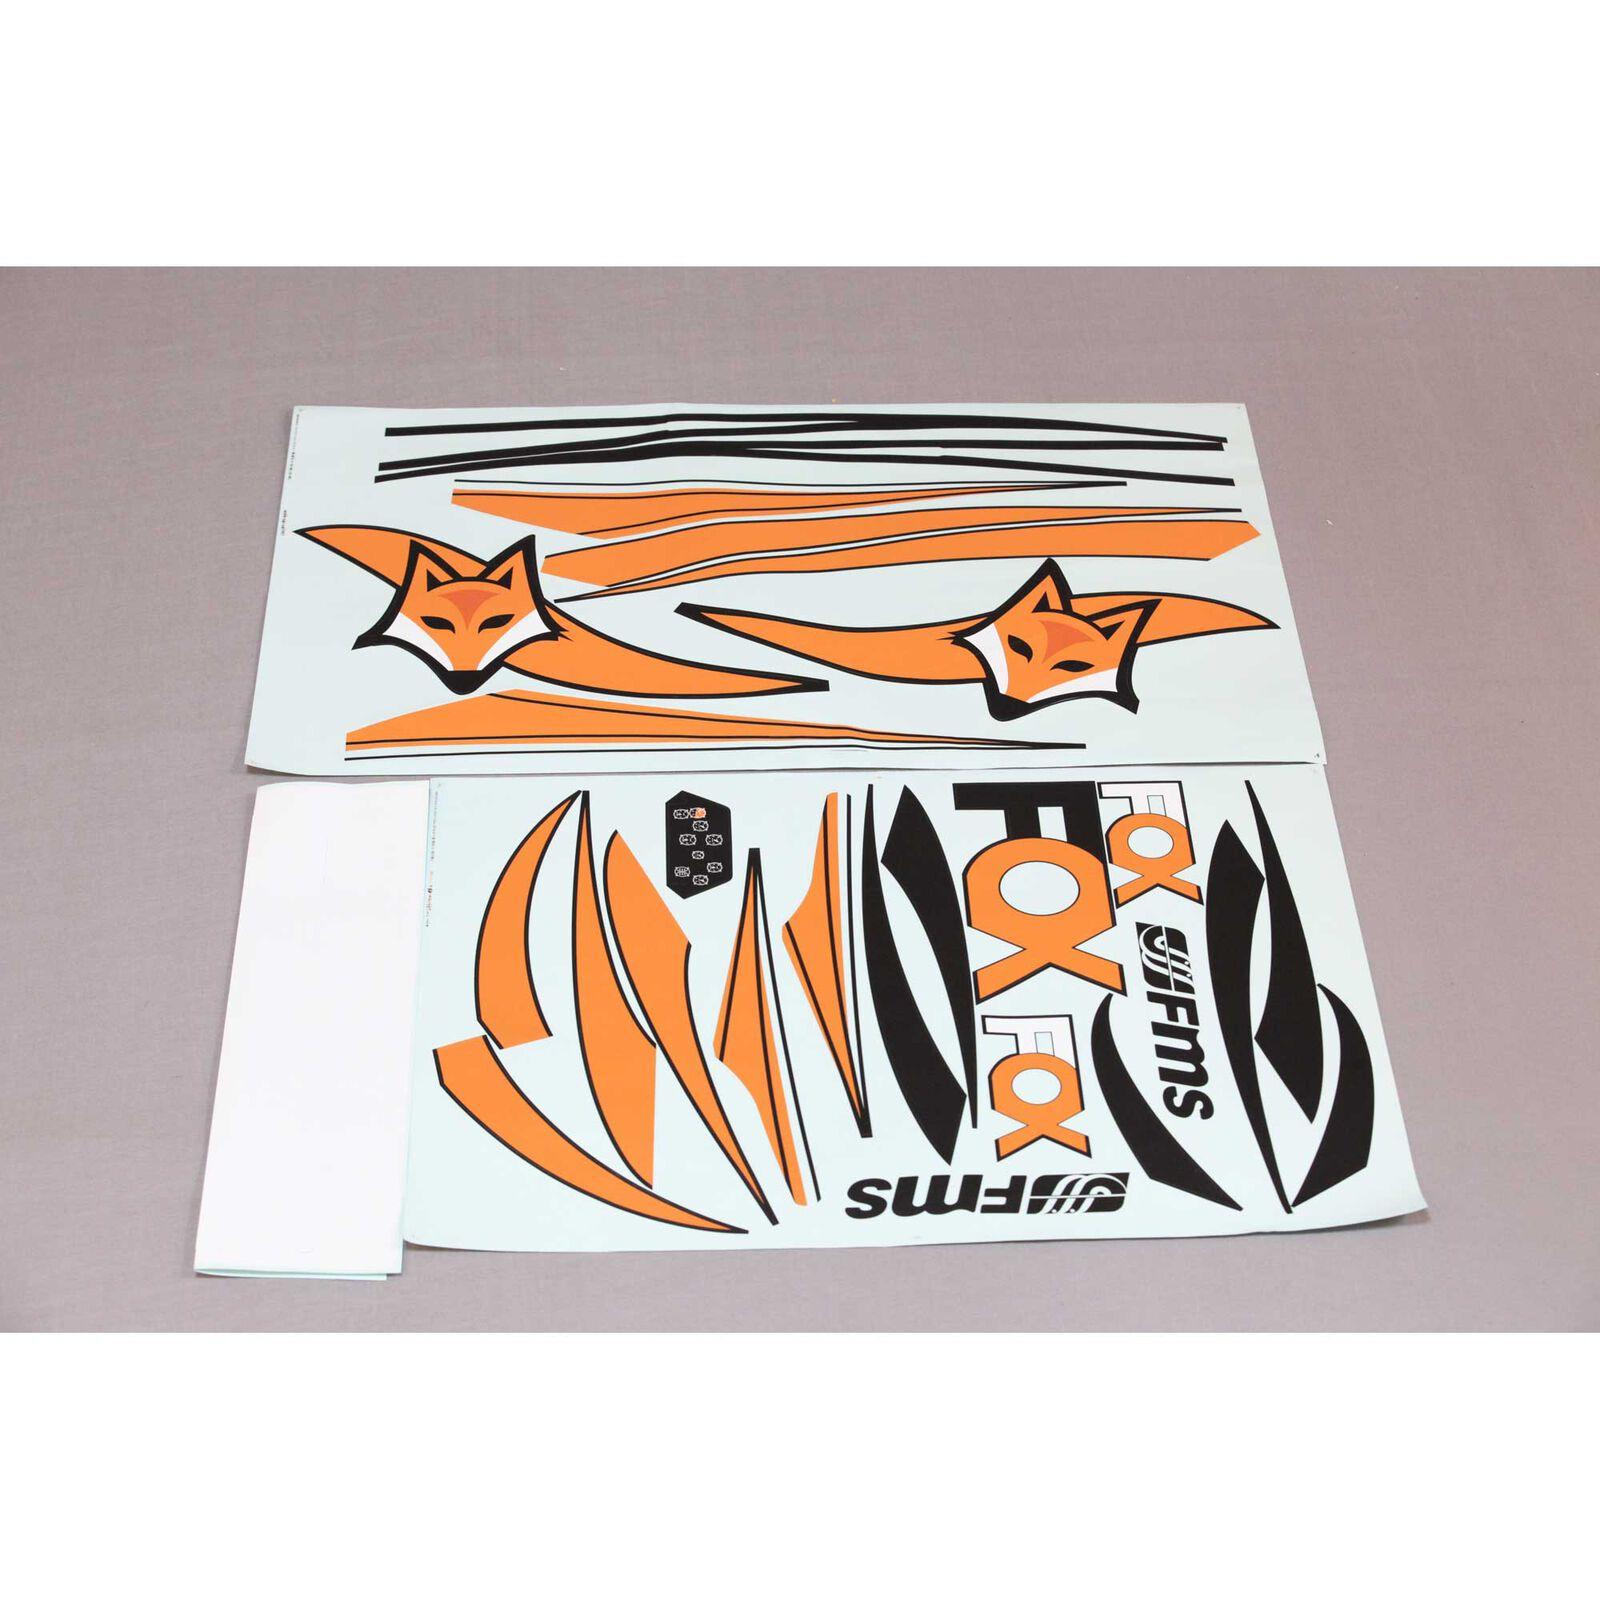 Decal Sheet: Fox EP Glider, 3000mm